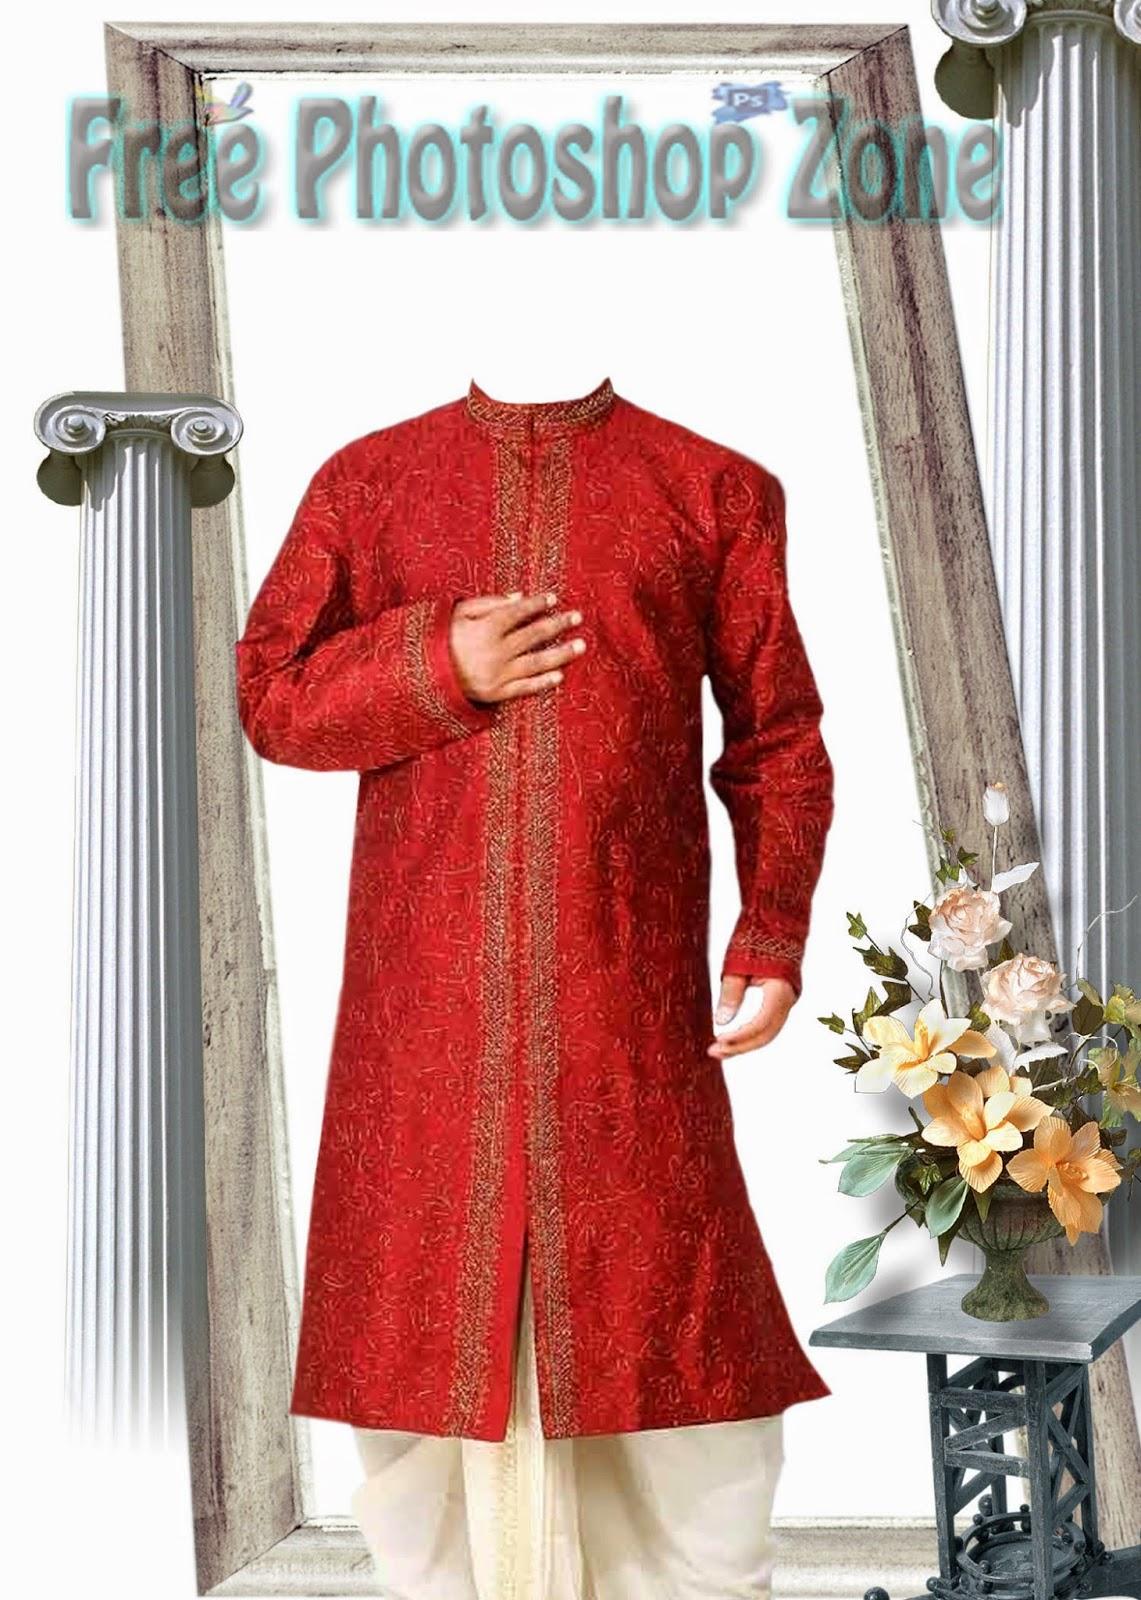 Photoshop Mens Dress Templates 102